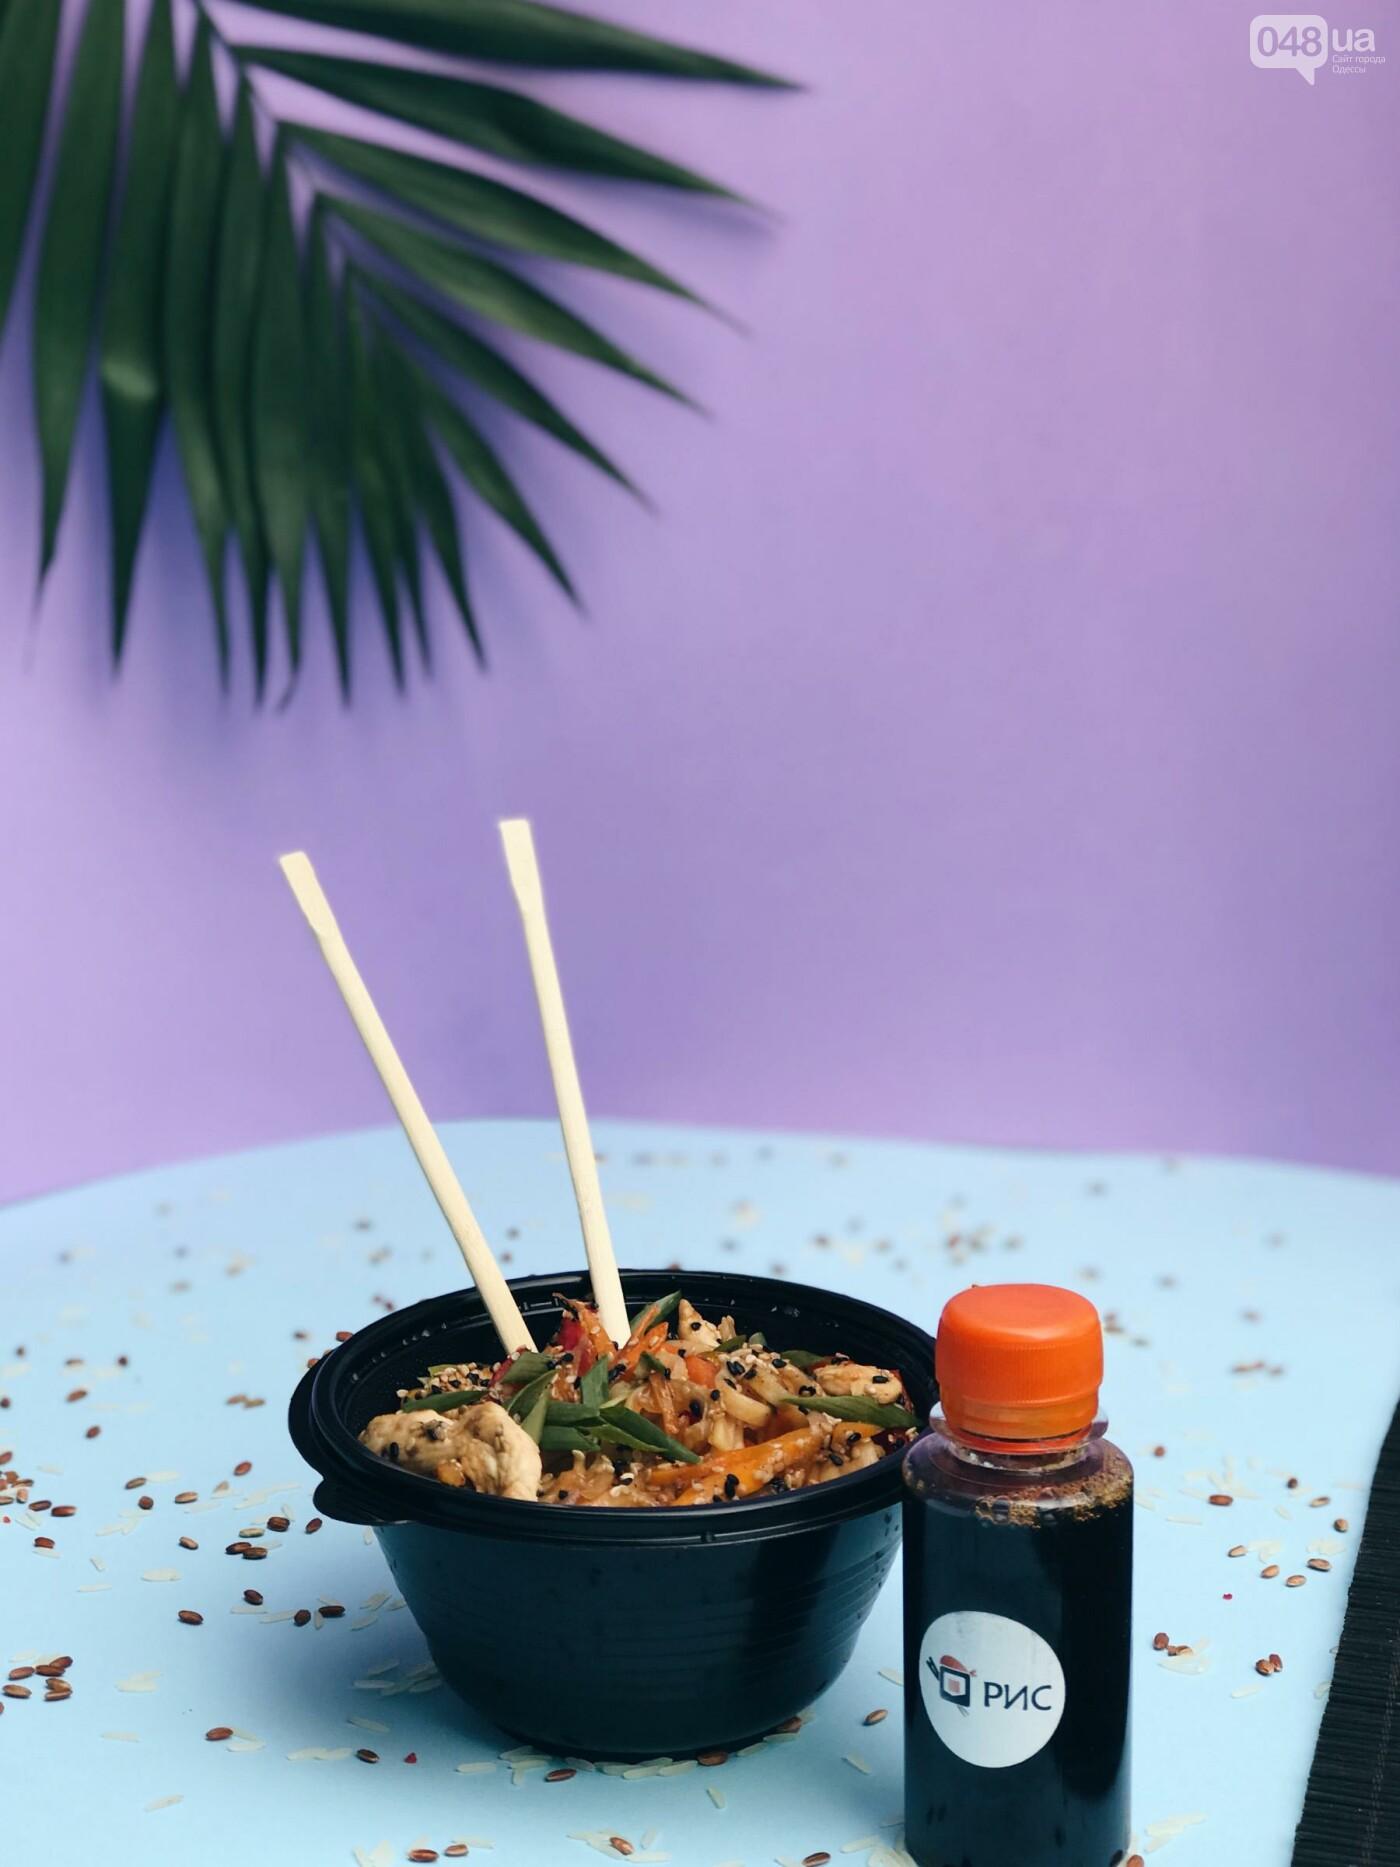 ris.od.ua - японская кухня у вас дома!, фото-3